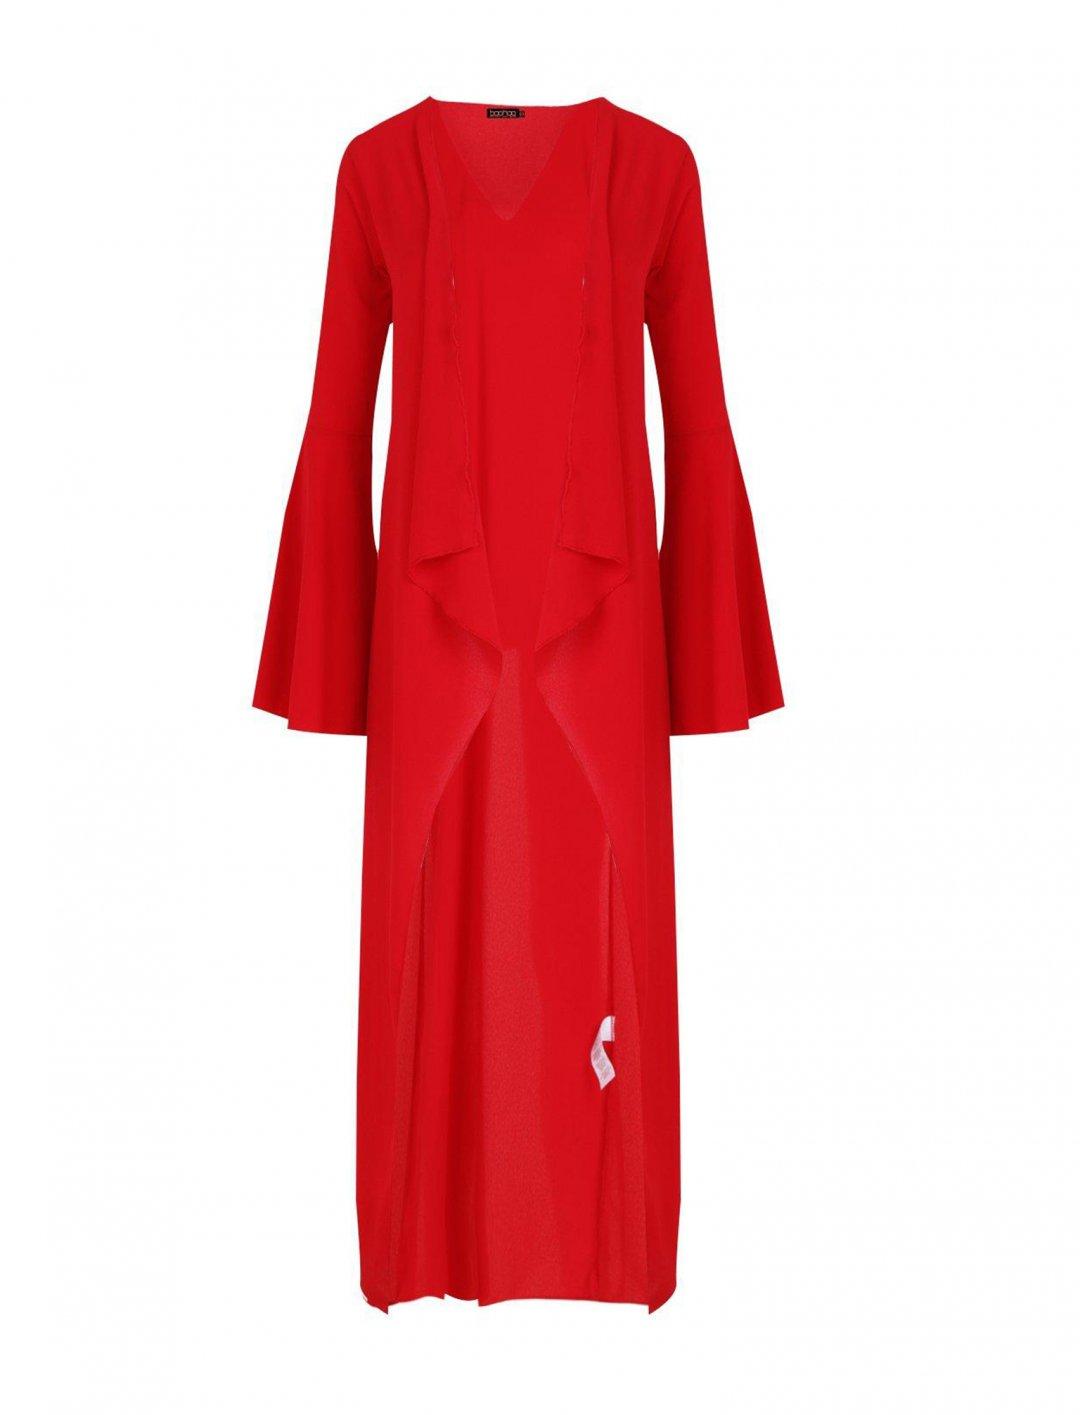 "Kimono Jacket {""id"":5,""product_section_id"":1,""name"":""Clothing"",""order"":5} boohoo"